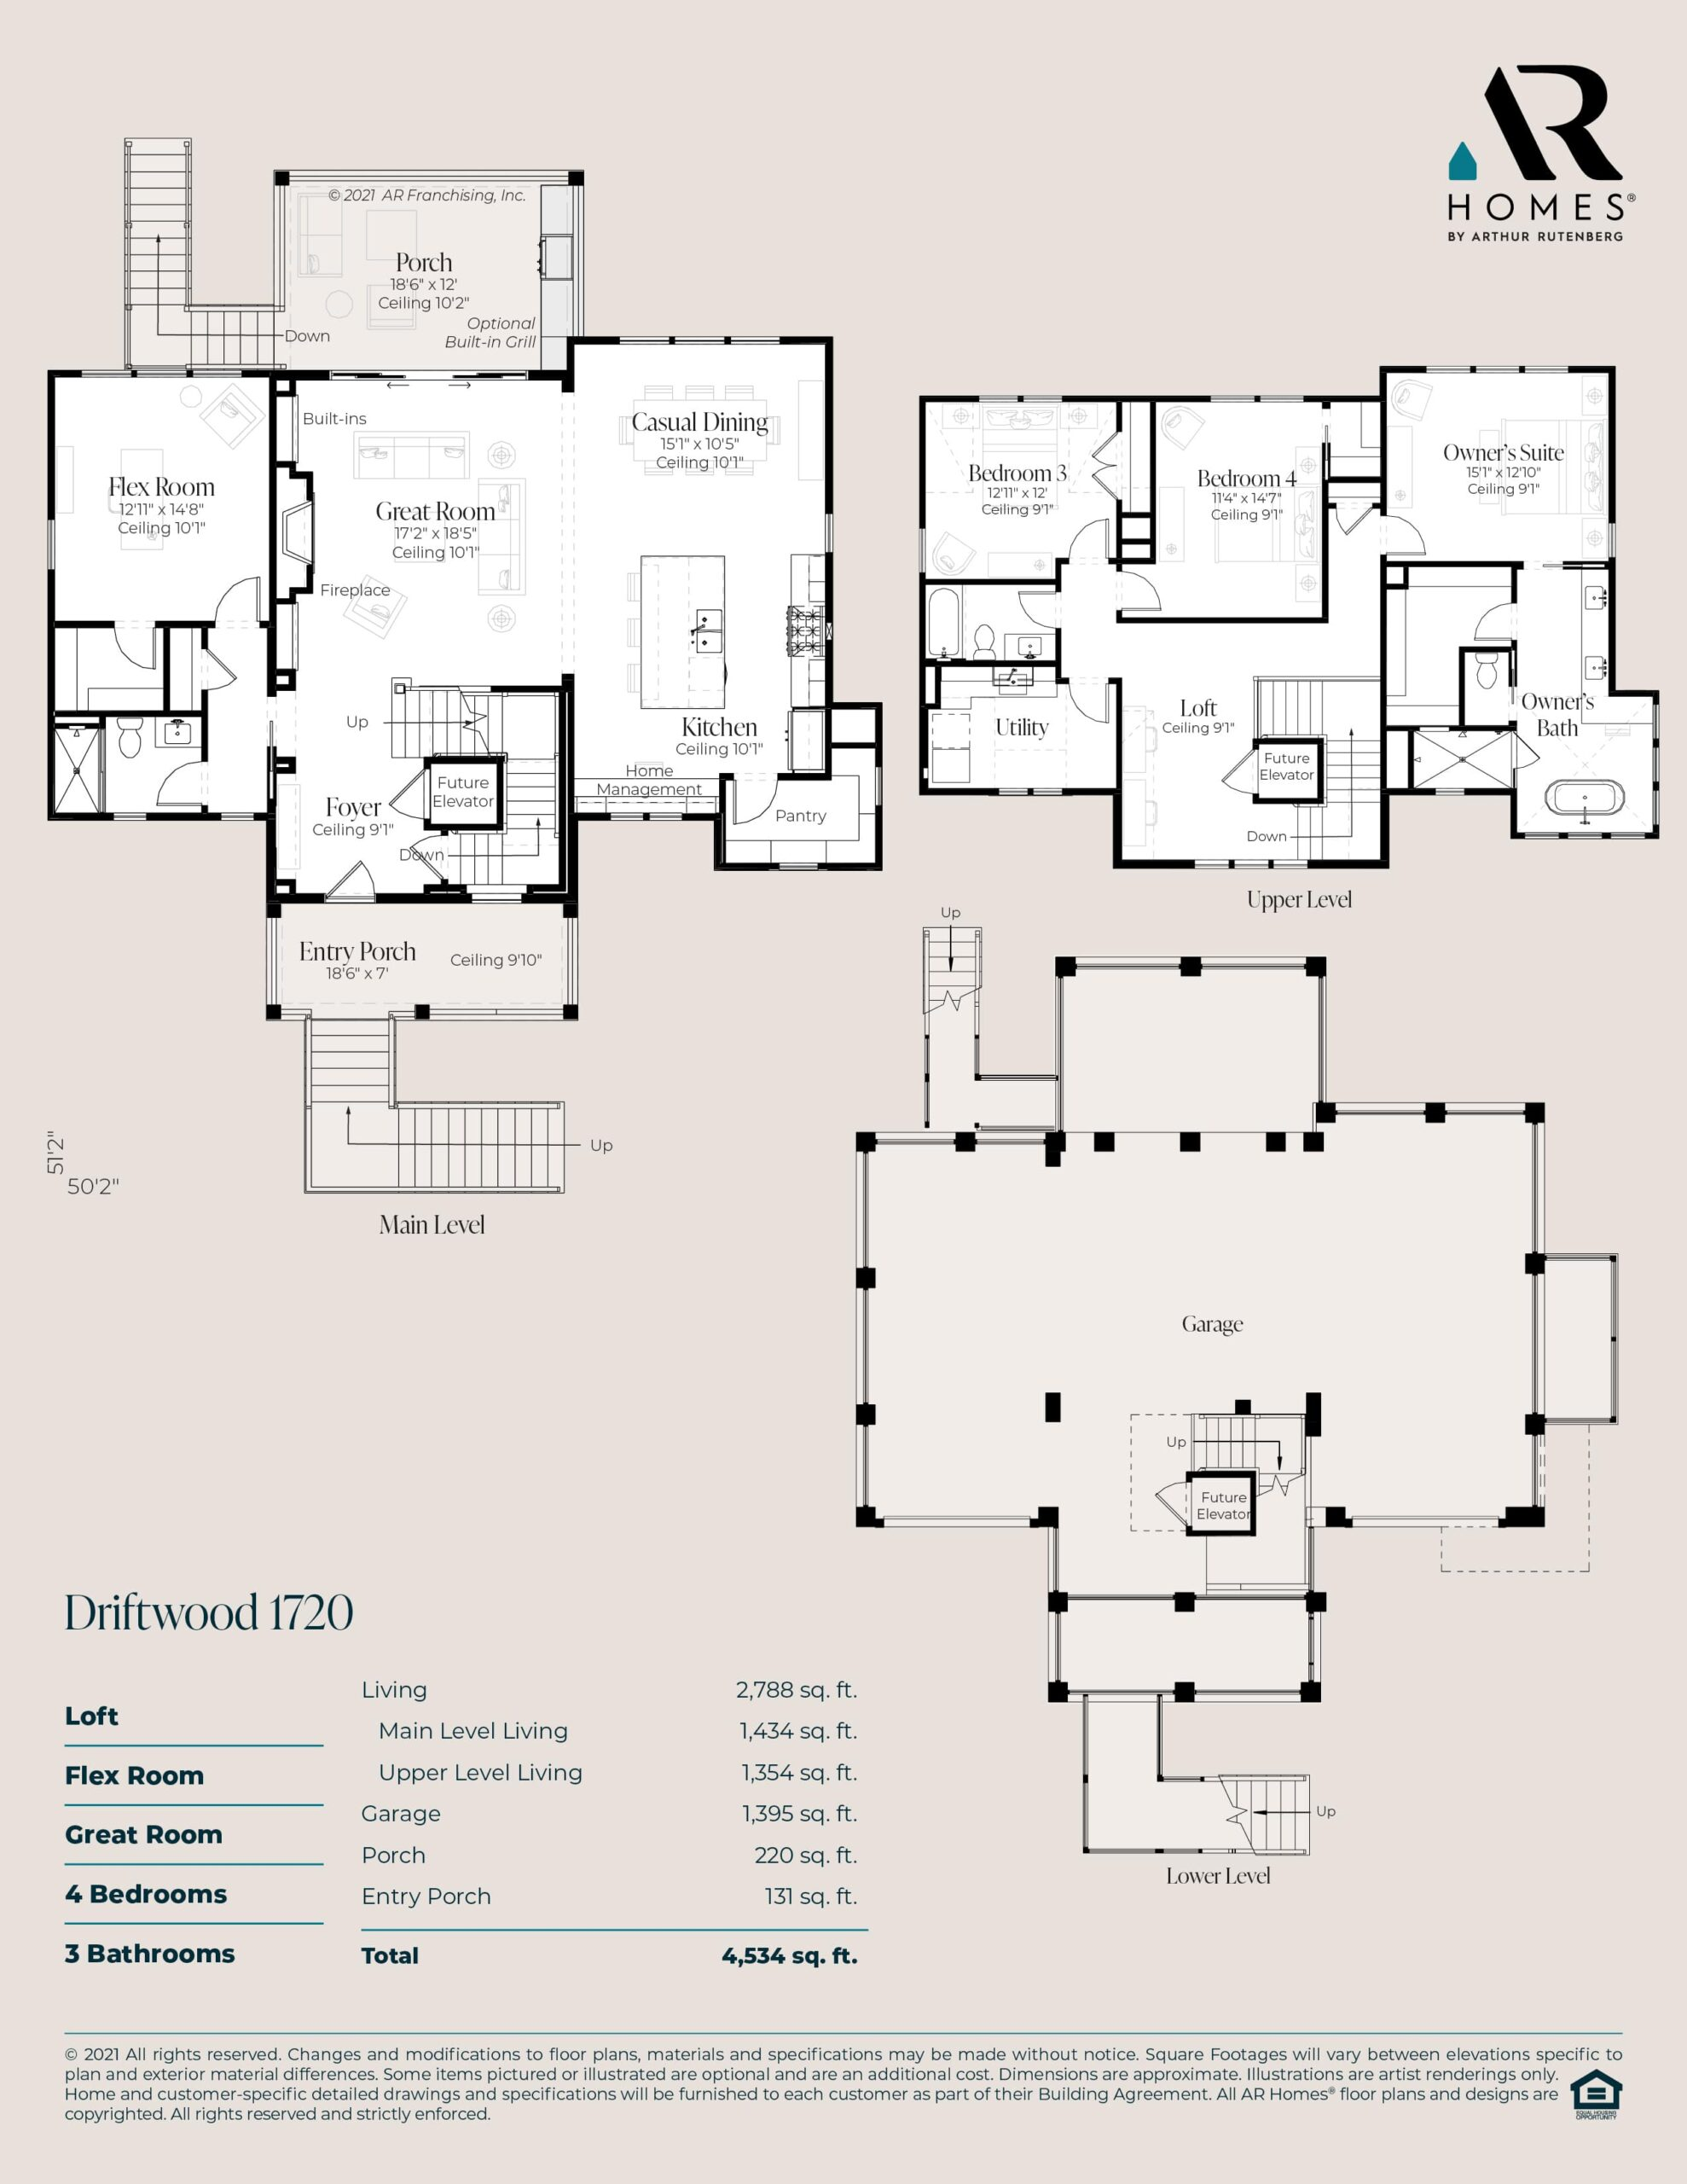 Driftwood 1720 Custom Home Floor Plan